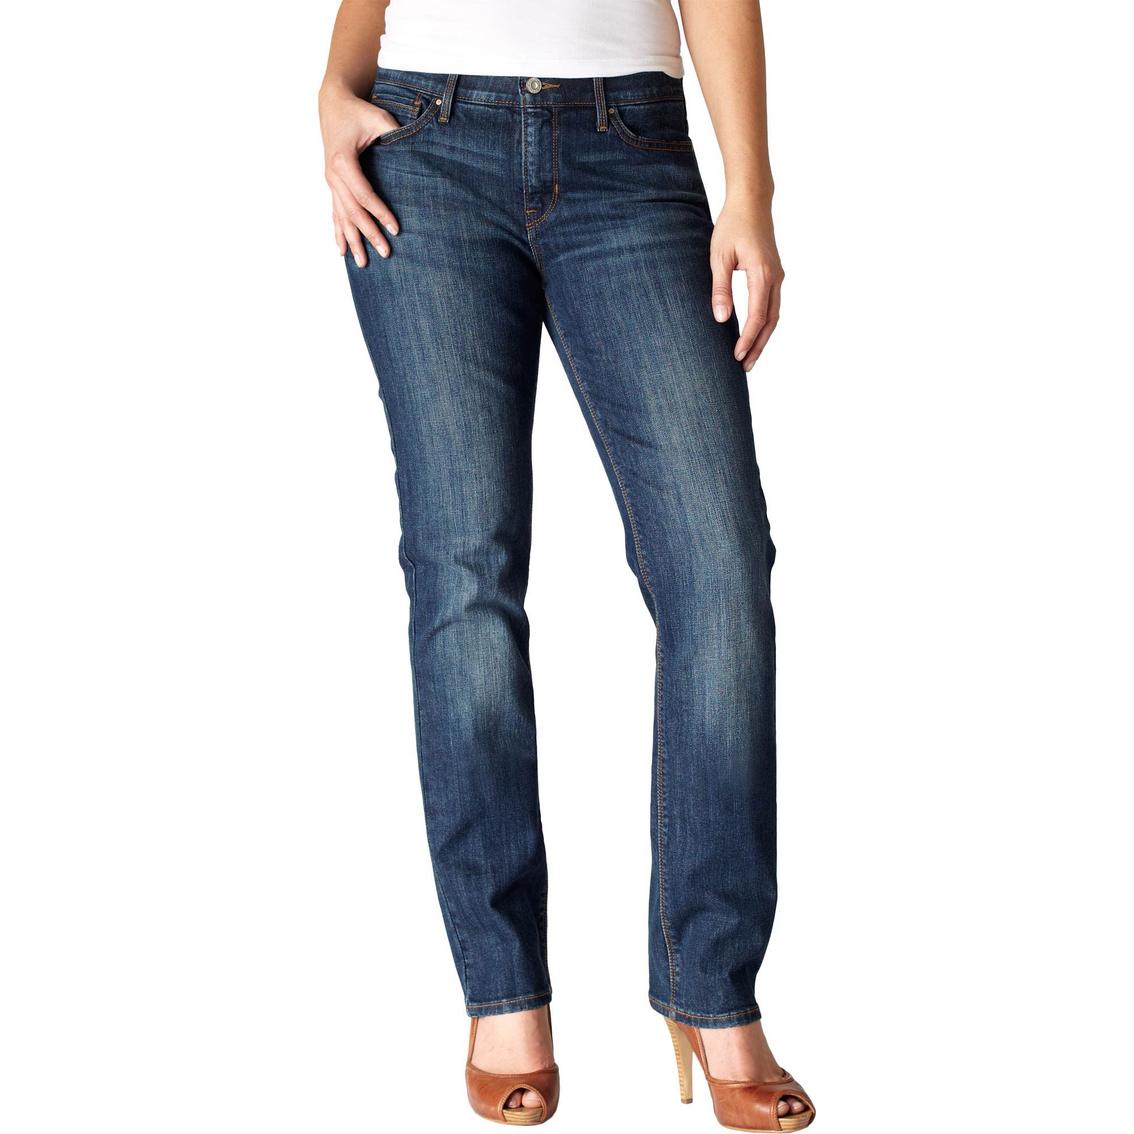 Levi's 525 Perfect Waist Straight Leg Jeans